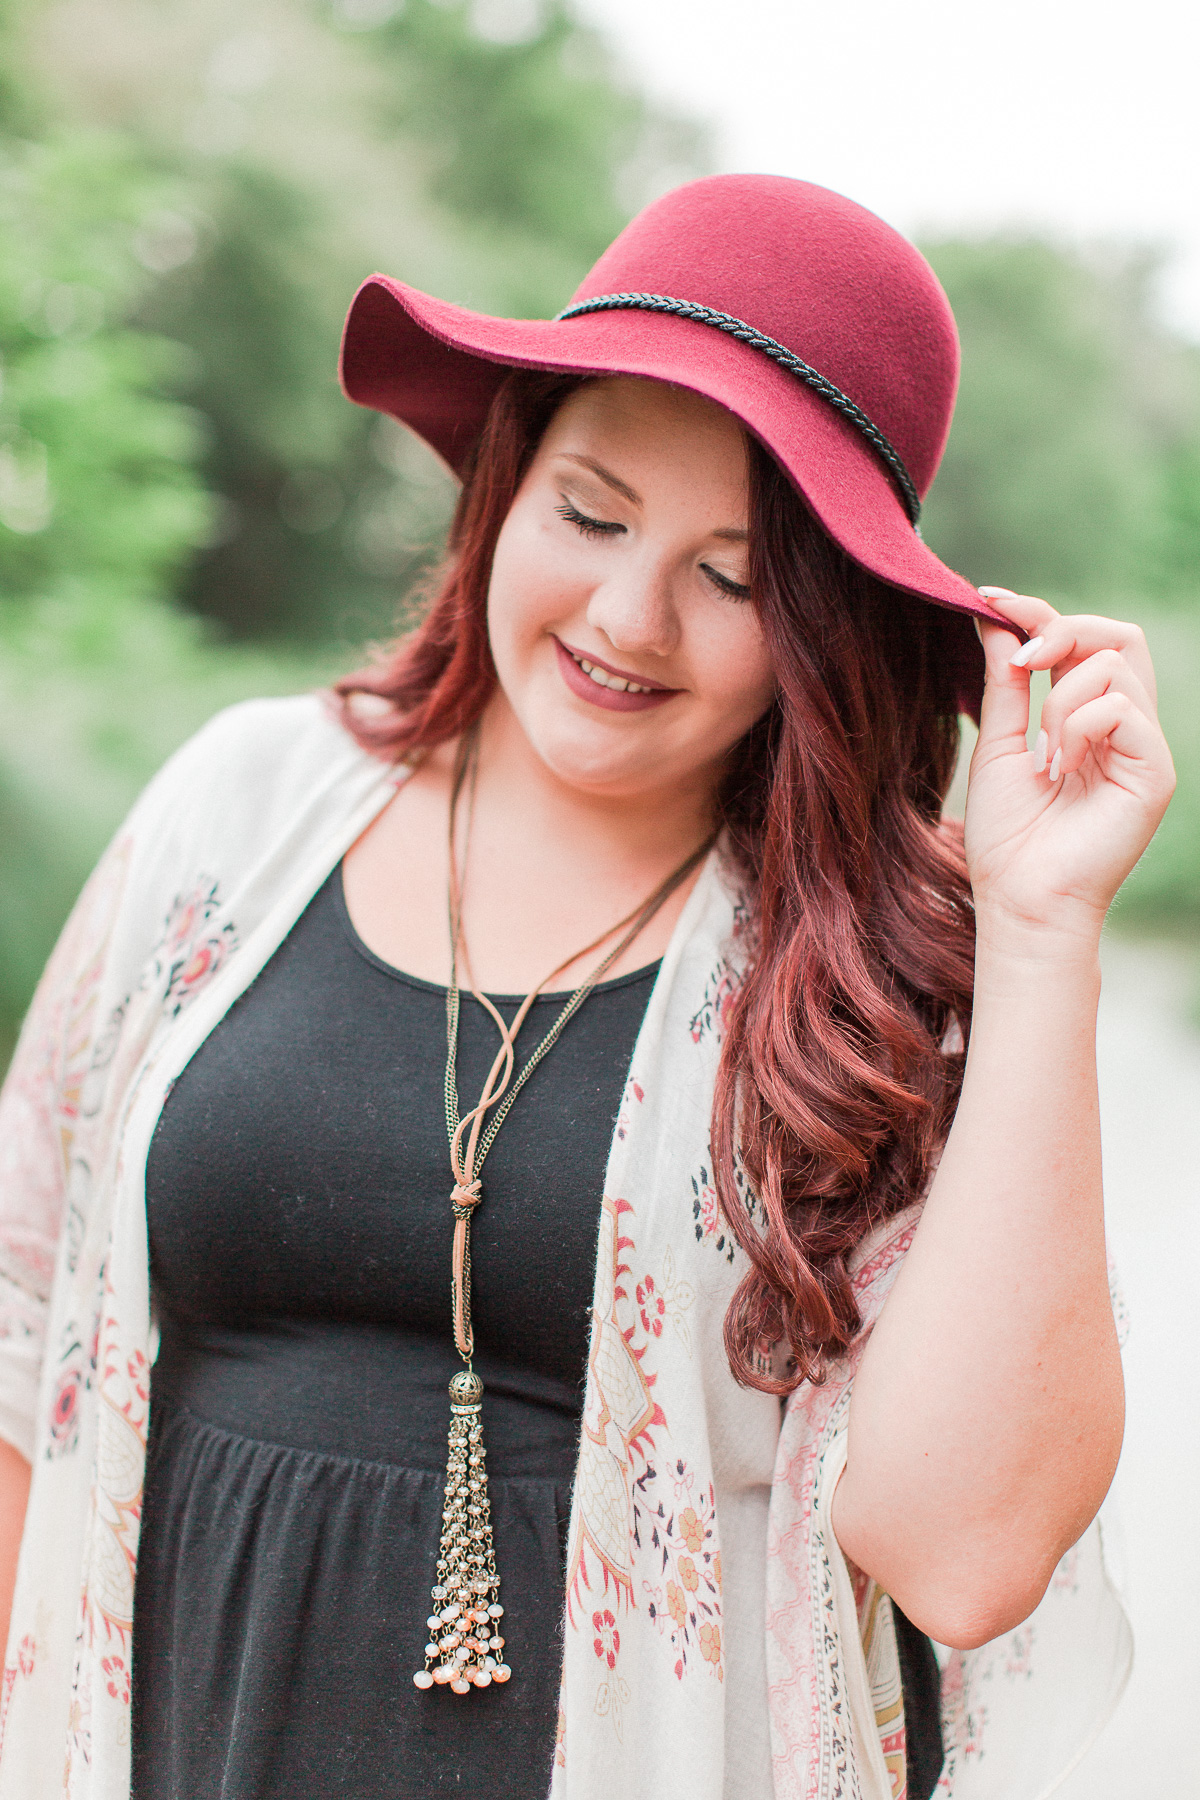 Mollie holding hat